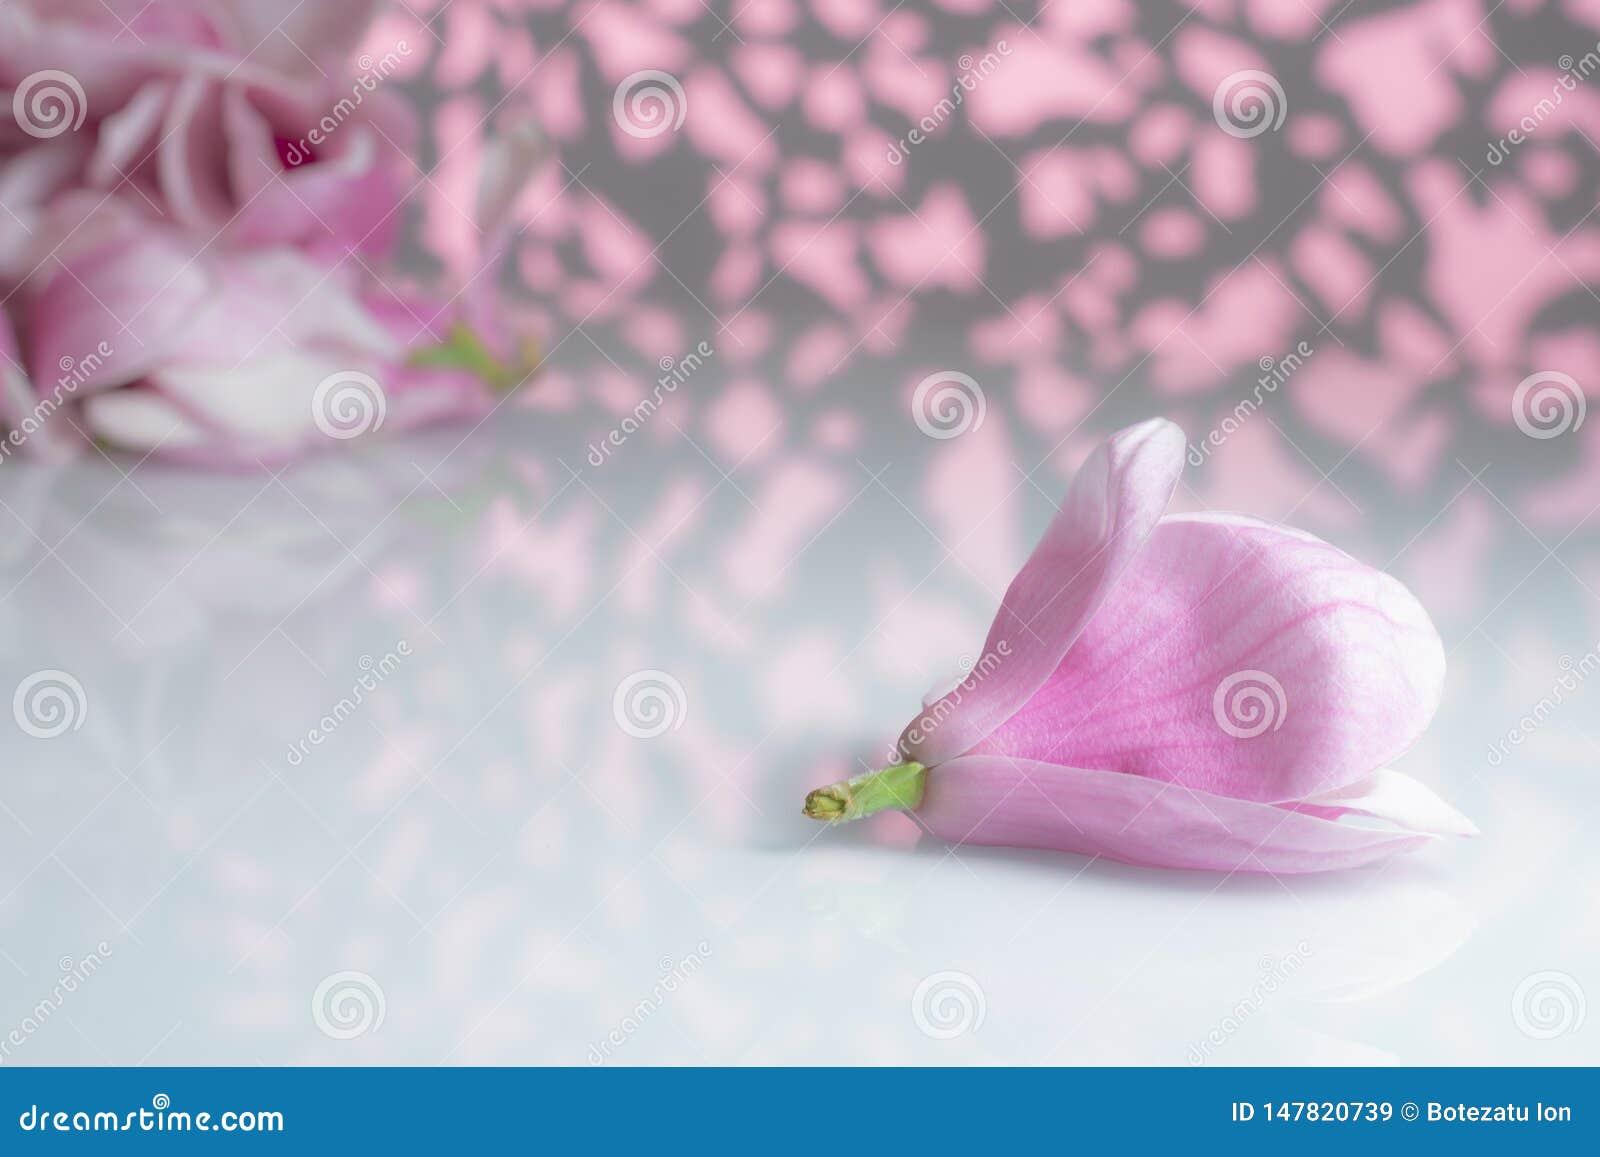 Magnolia flower on a white board